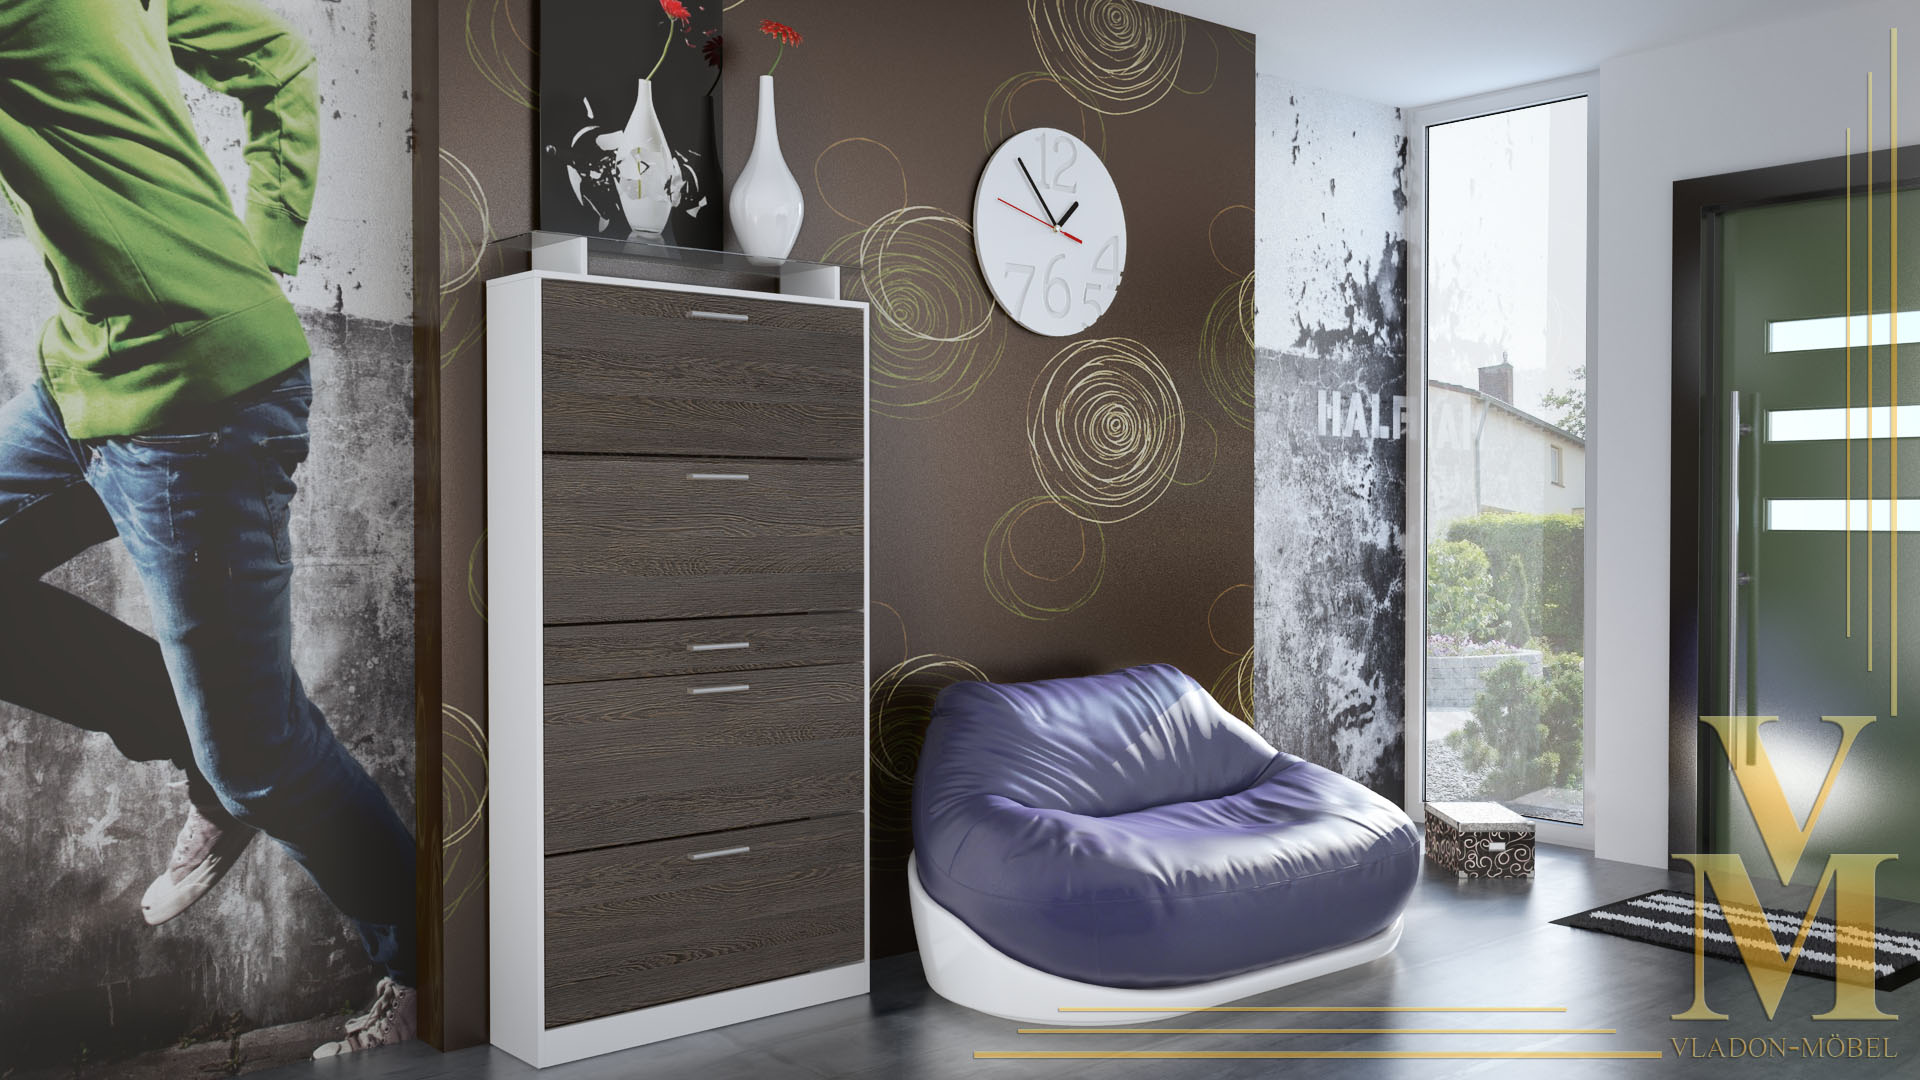 schuhschrank schuhkipper dielen flur schrank rima wei hochglanz naturt ne ebay. Black Bedroom Furniture Sets. Home Design Ideas